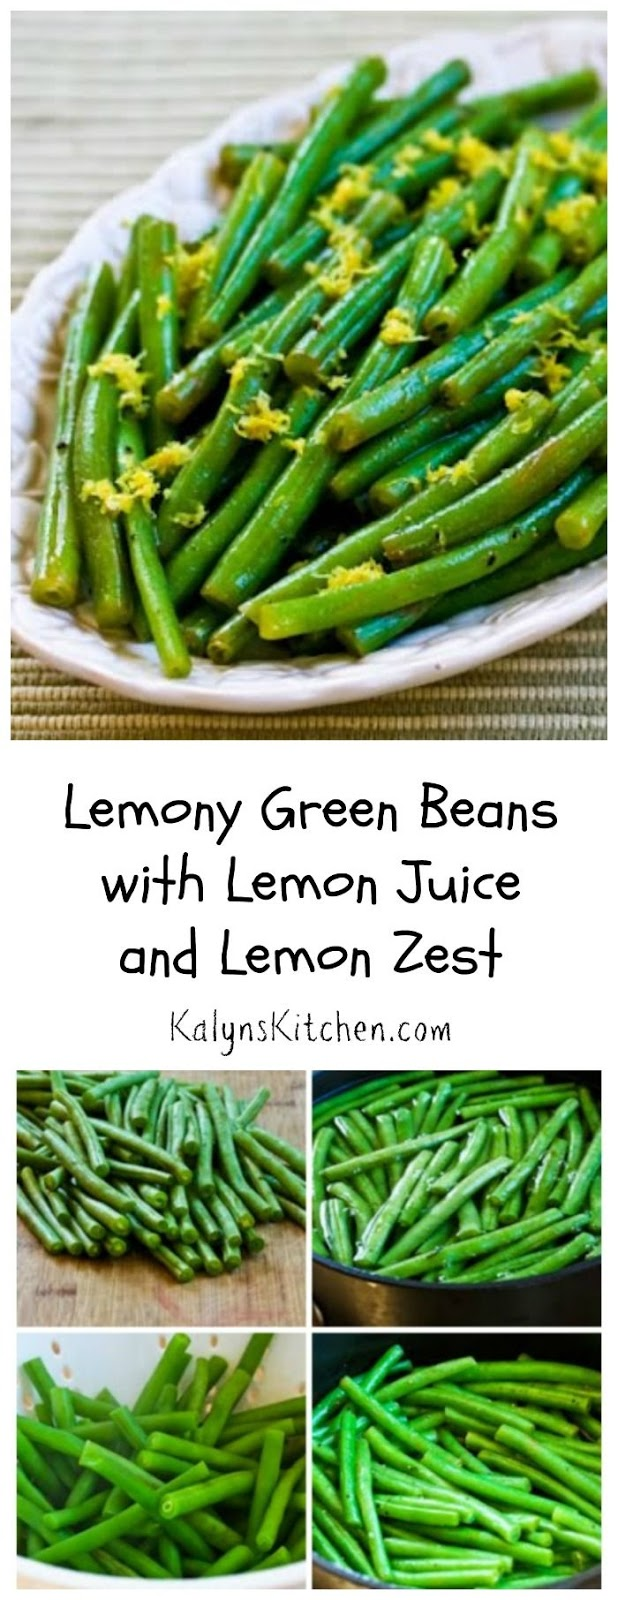 Kitchen®: Lemony Green Beans Recipe with Lemon Juice and Lemon Zest ...